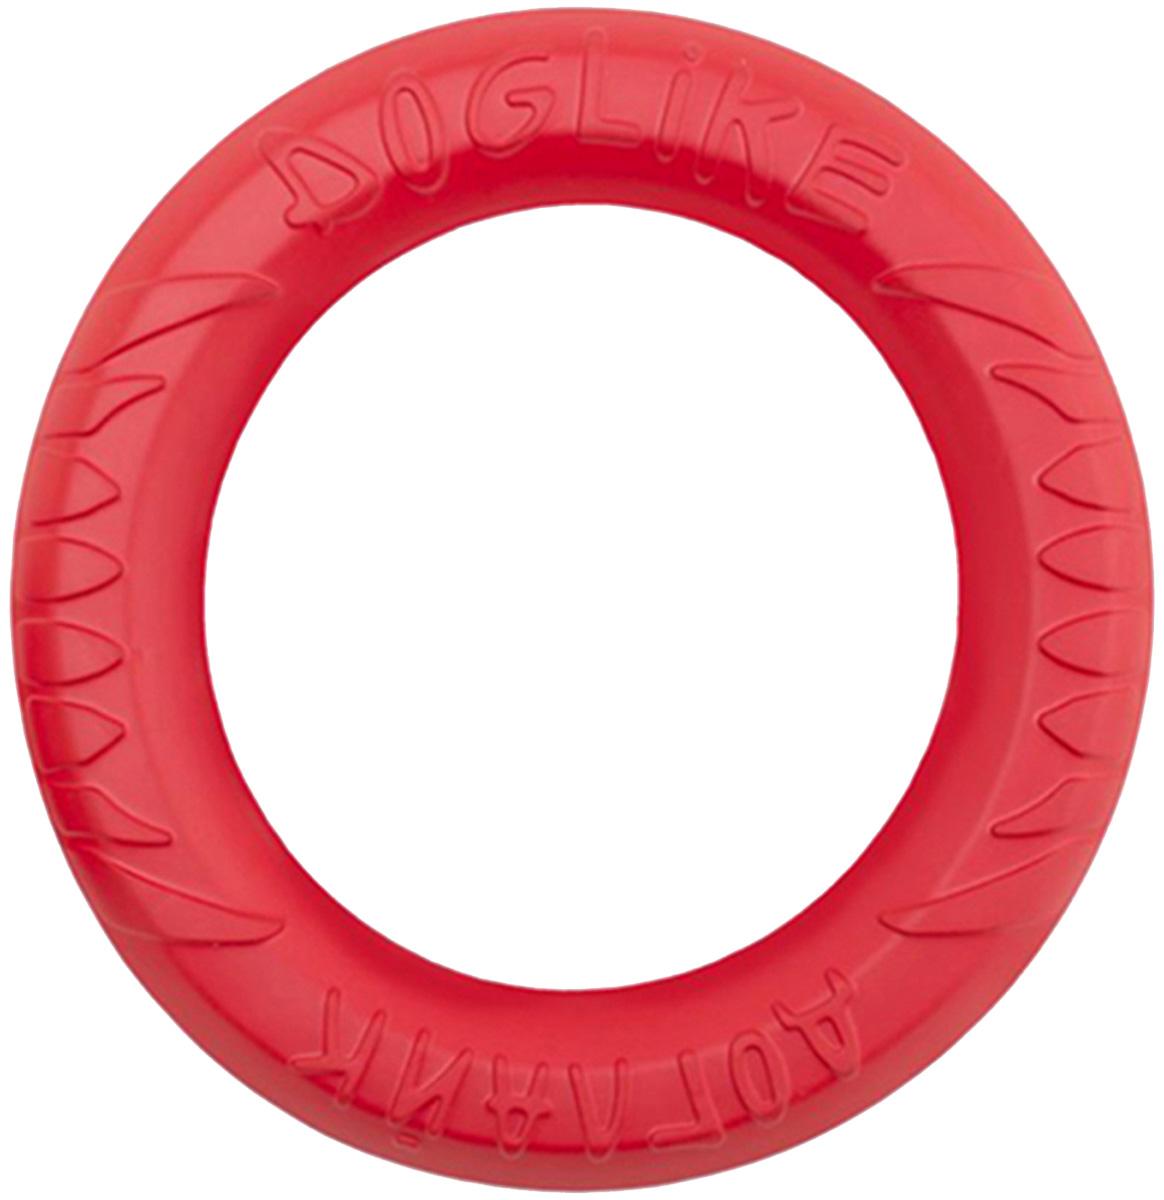 Снаряд Tug & Twist кольцо восьмигранное крохотное Doglike коралловый (1 шт)